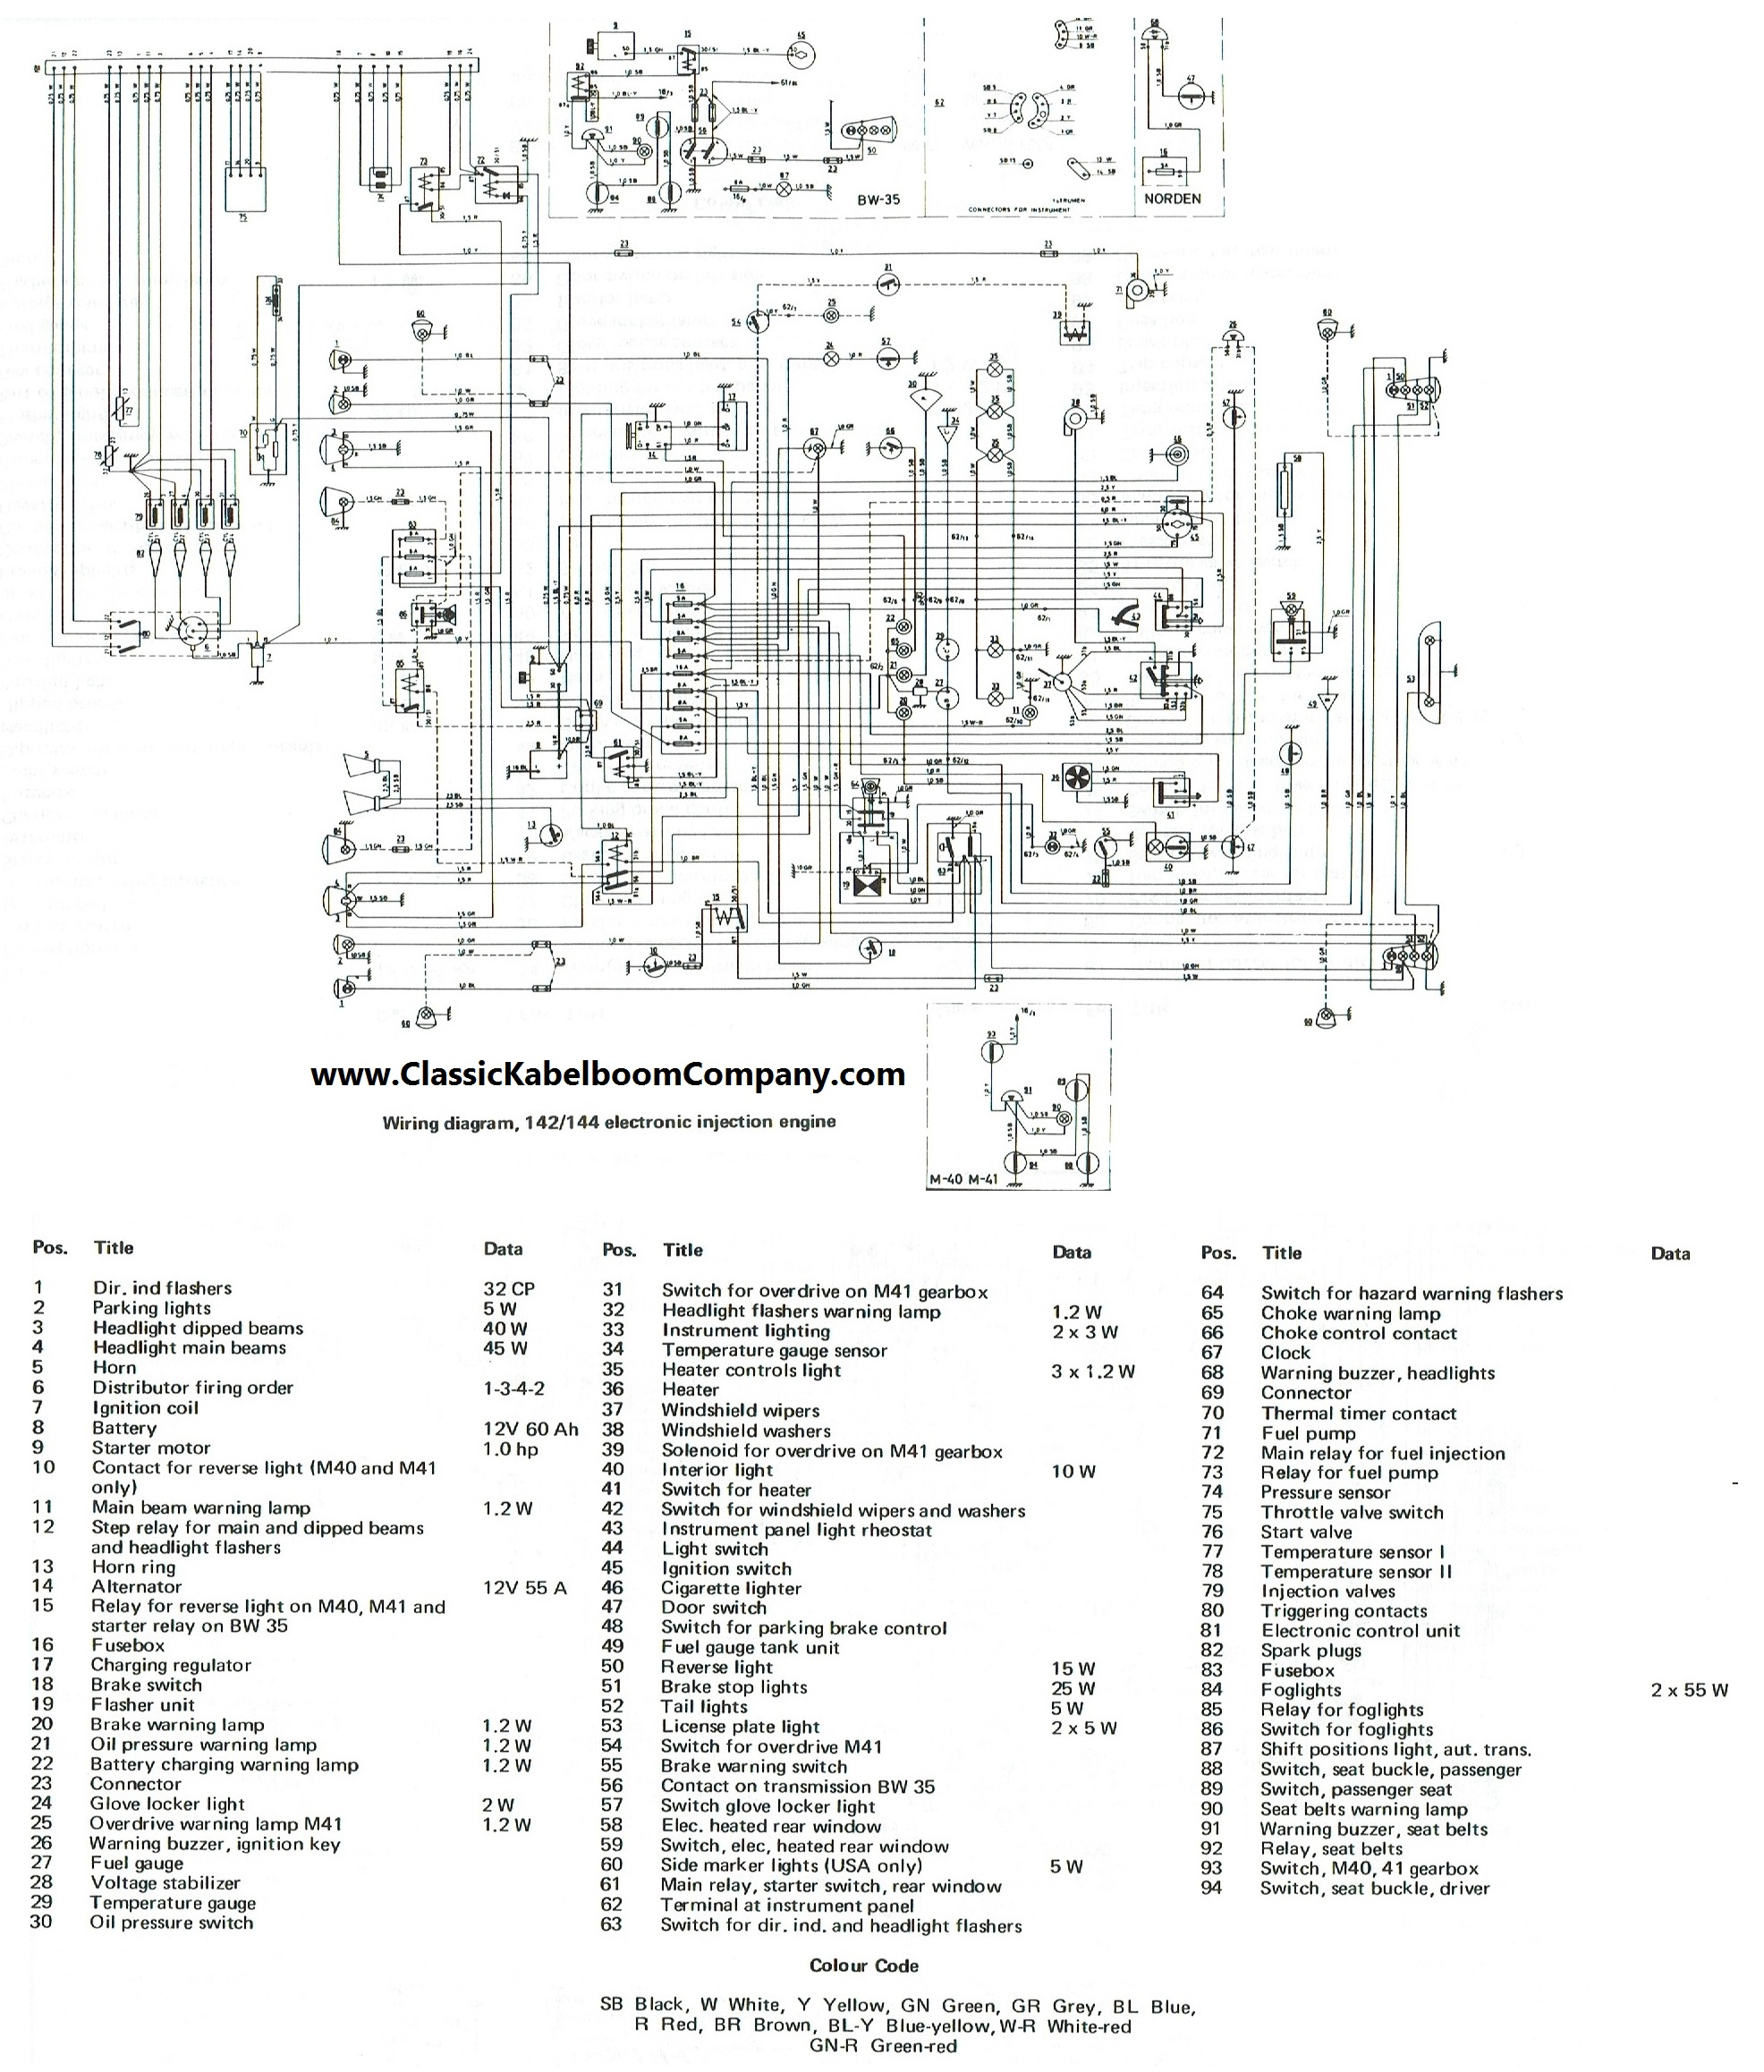 vol21?cdp=a classic kabelboom company elektrisch bedrading schema volvo 1973 Volvo 142 at reclaimingppi.co